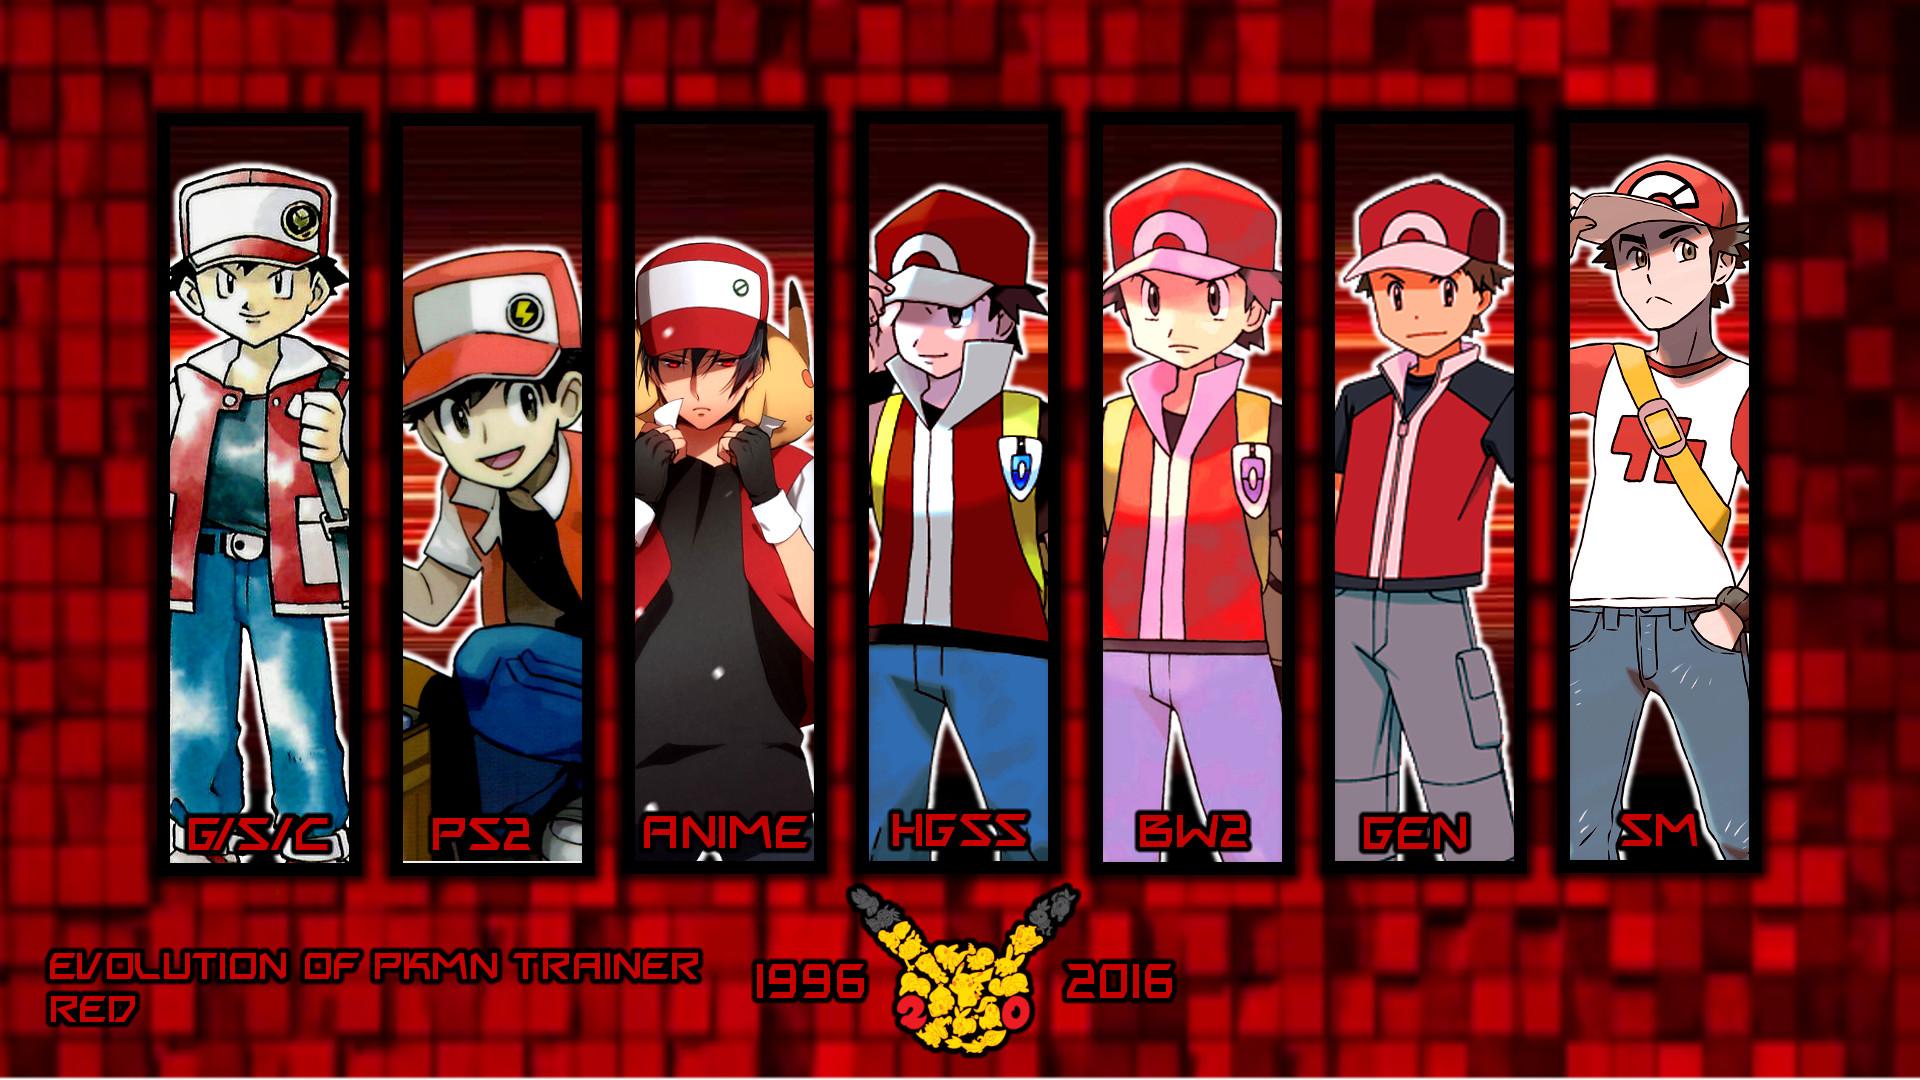 … Evolution Of Pkmn Trainer Red Wallpaper by MattPlaysVG